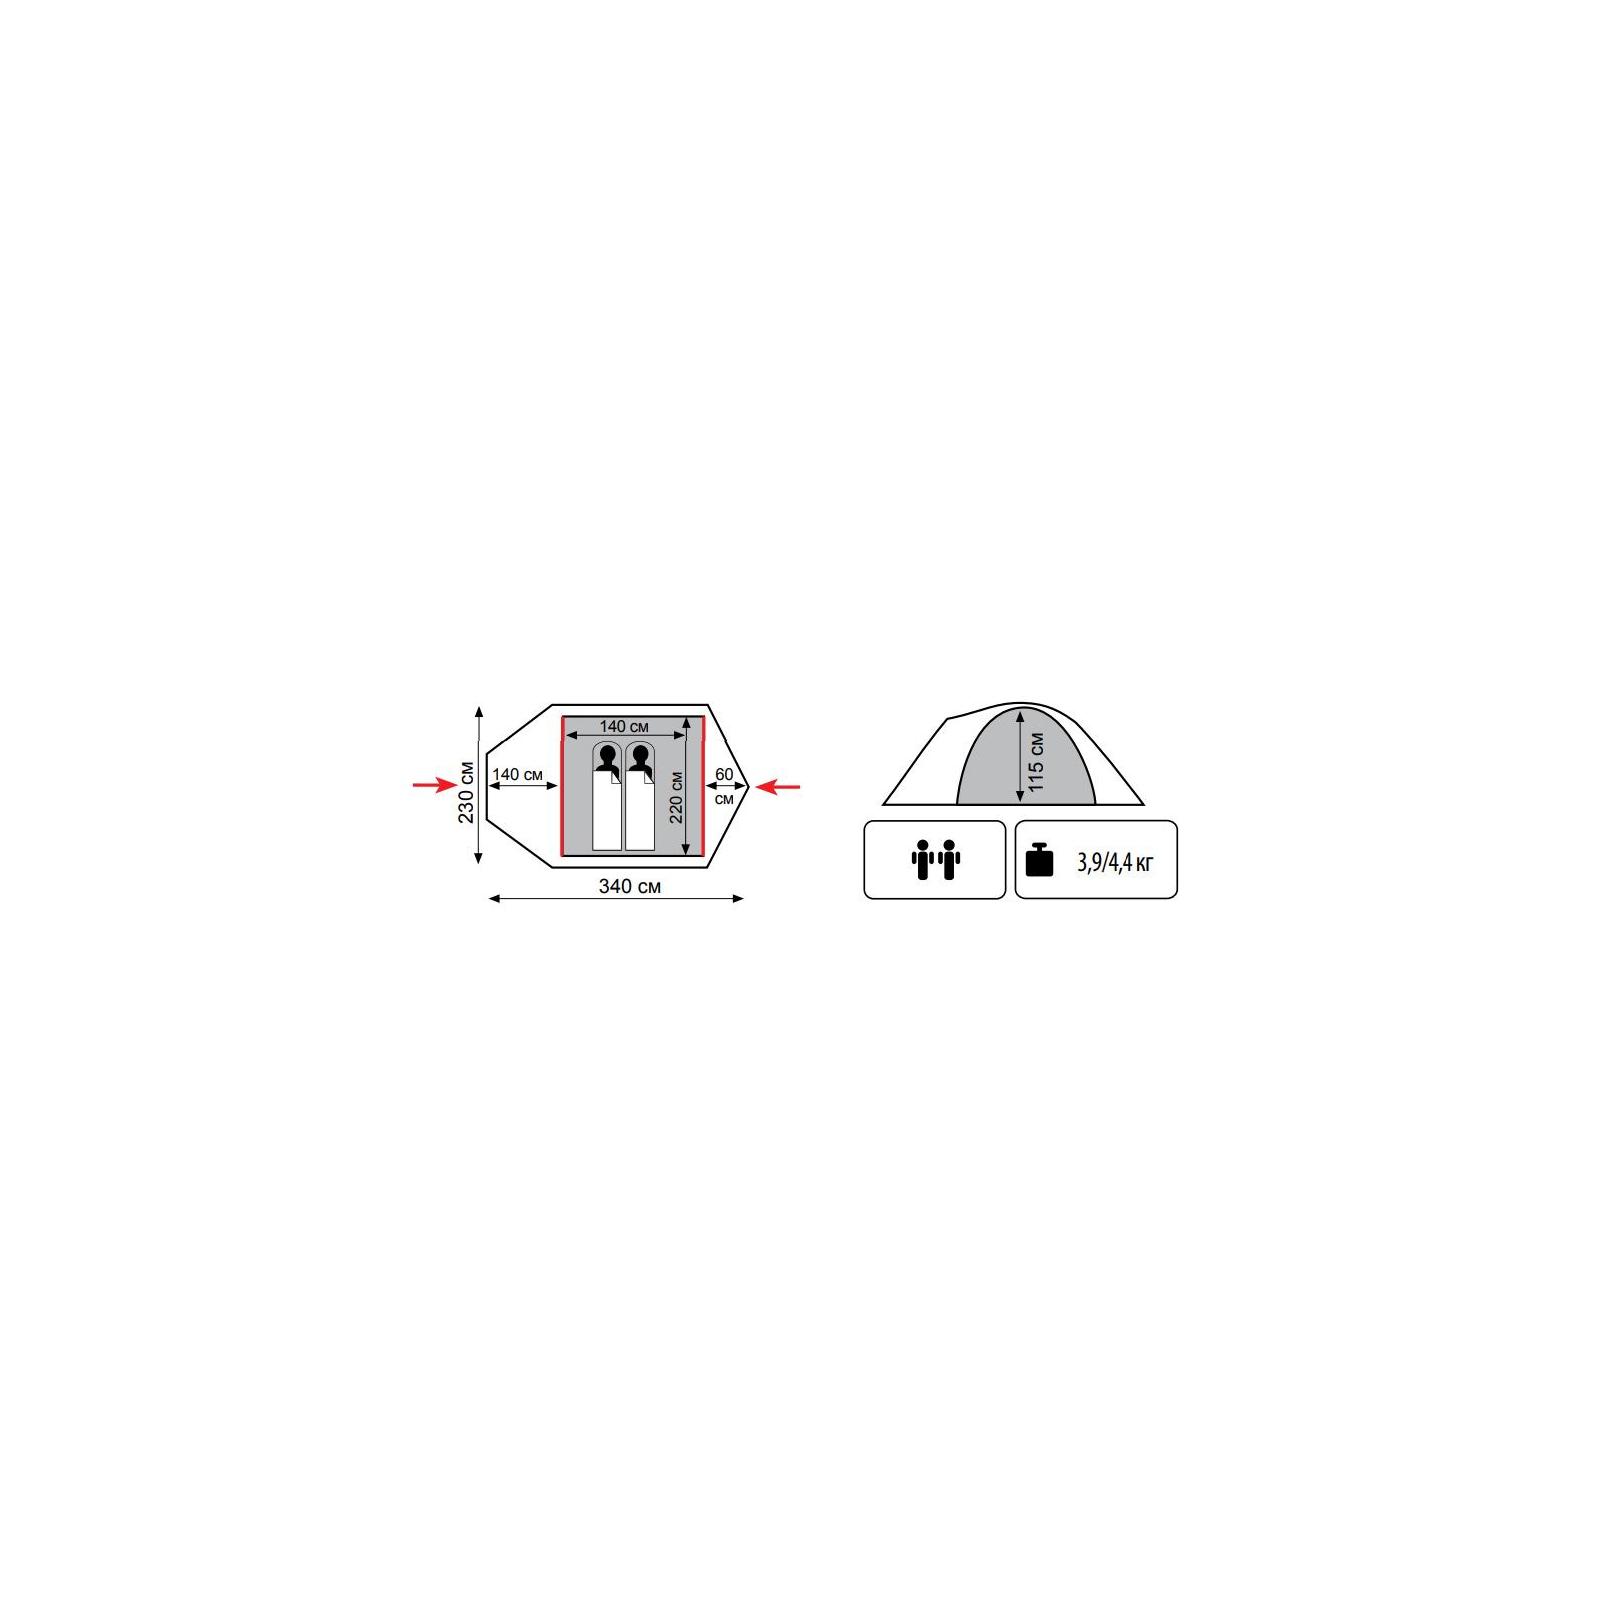 Палатка Tramp Colibri Plus v2 (TRT-035) изображение 2